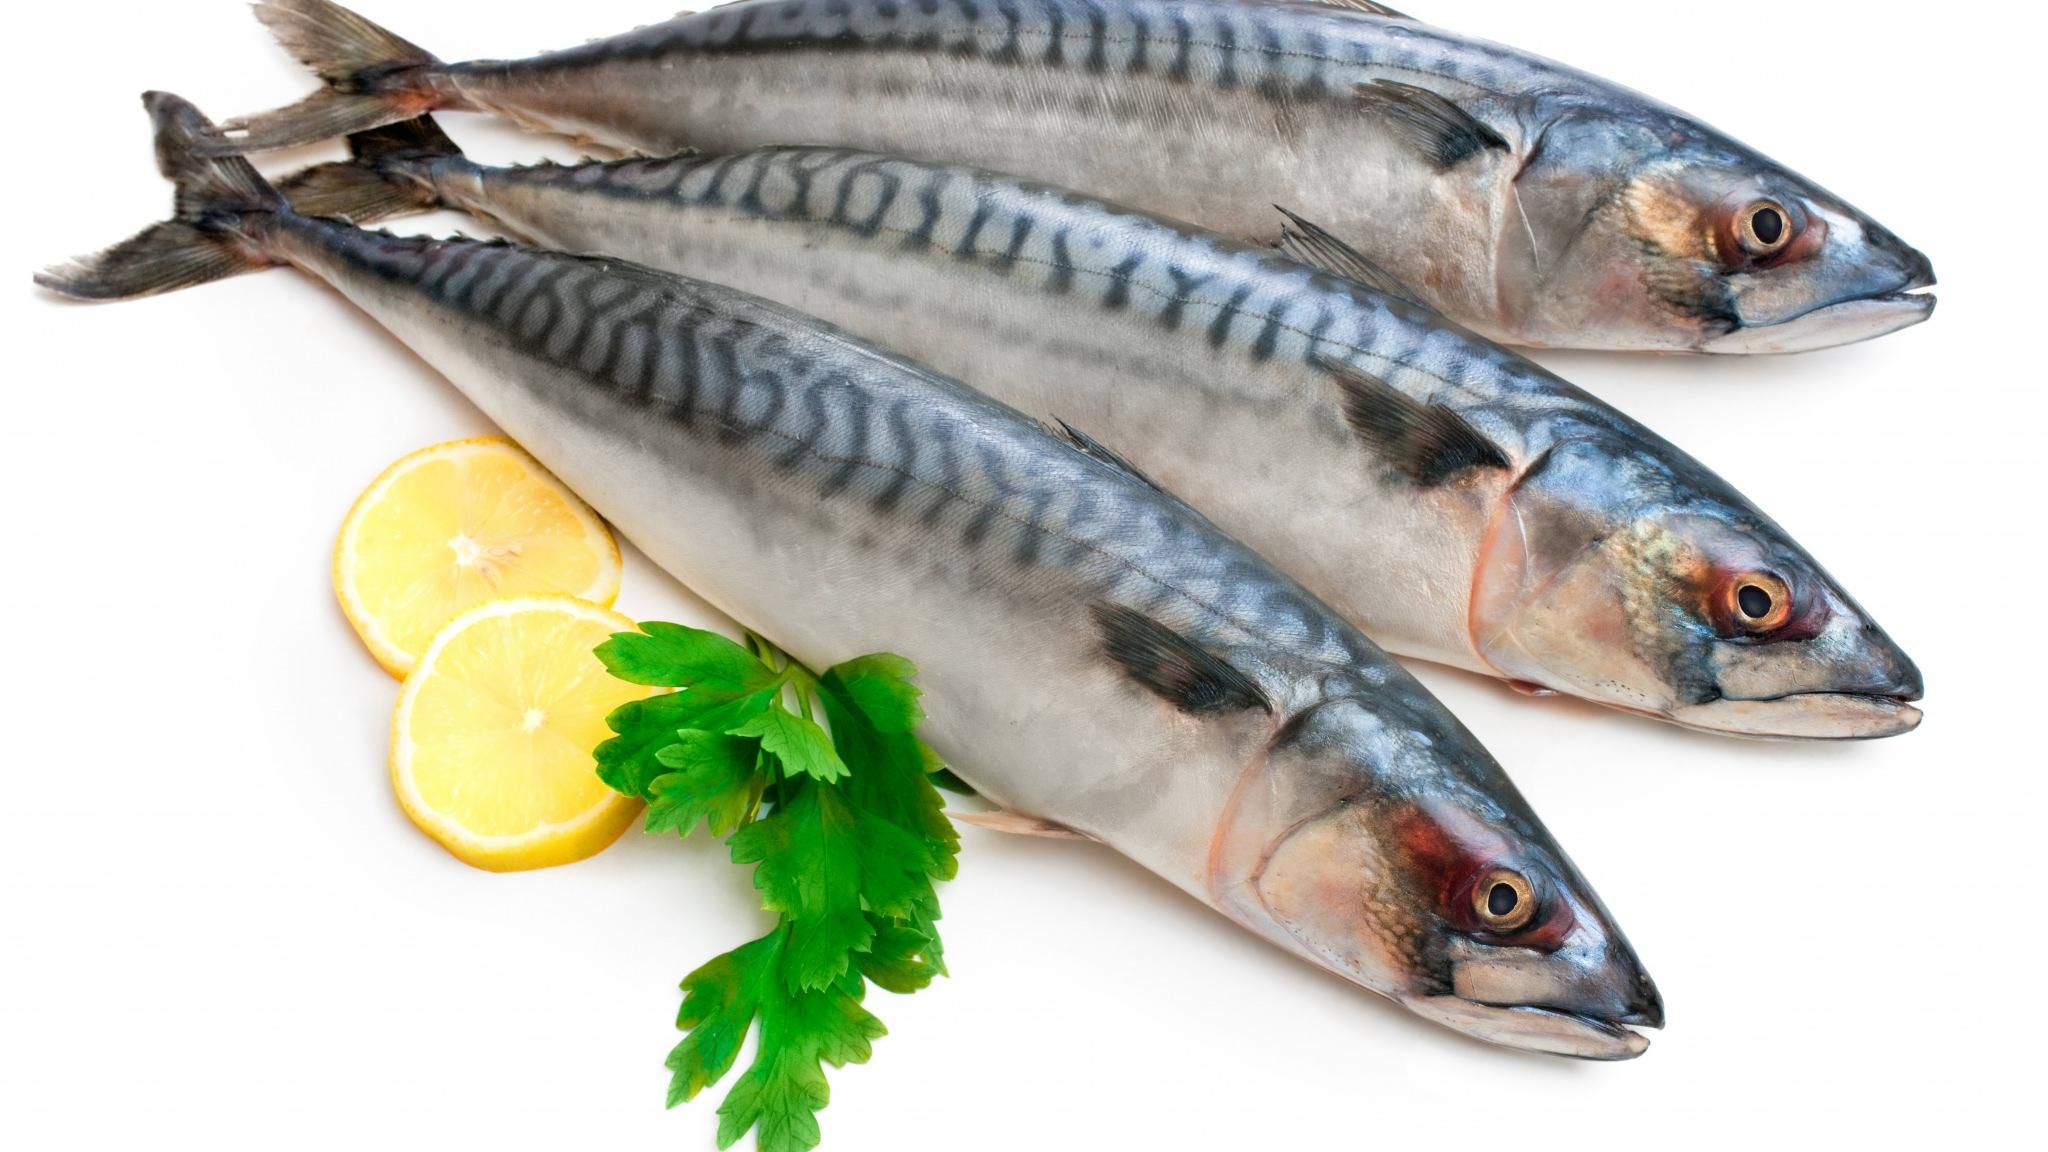 Salvelinus أكثر أنواع السمك المفيدة لصحة | صحيفة معاد